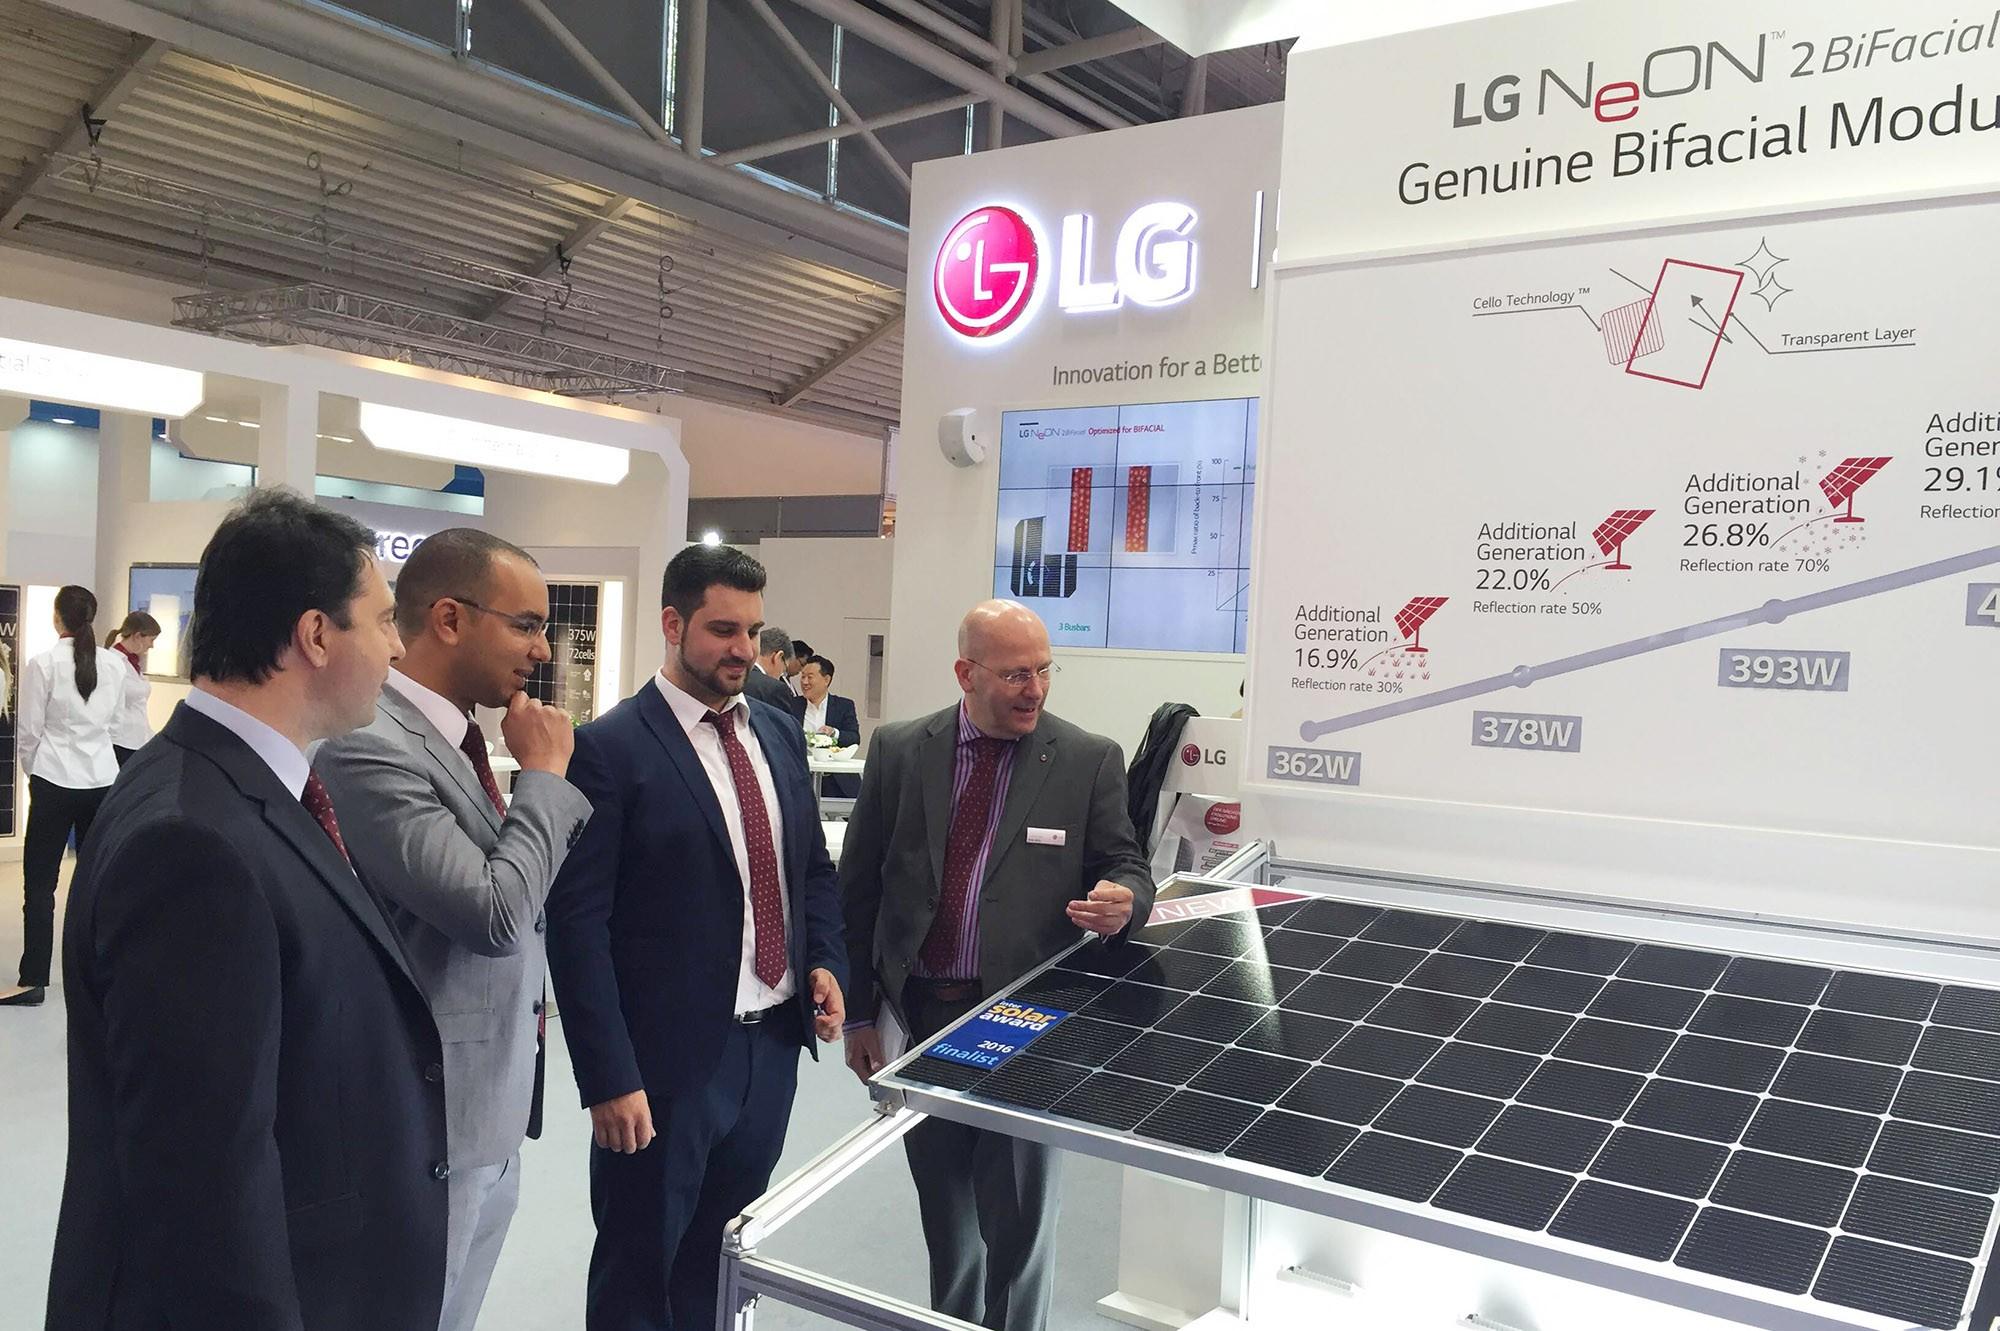 Eco innovations rule at LG InnoFest 2015 - Inside ID